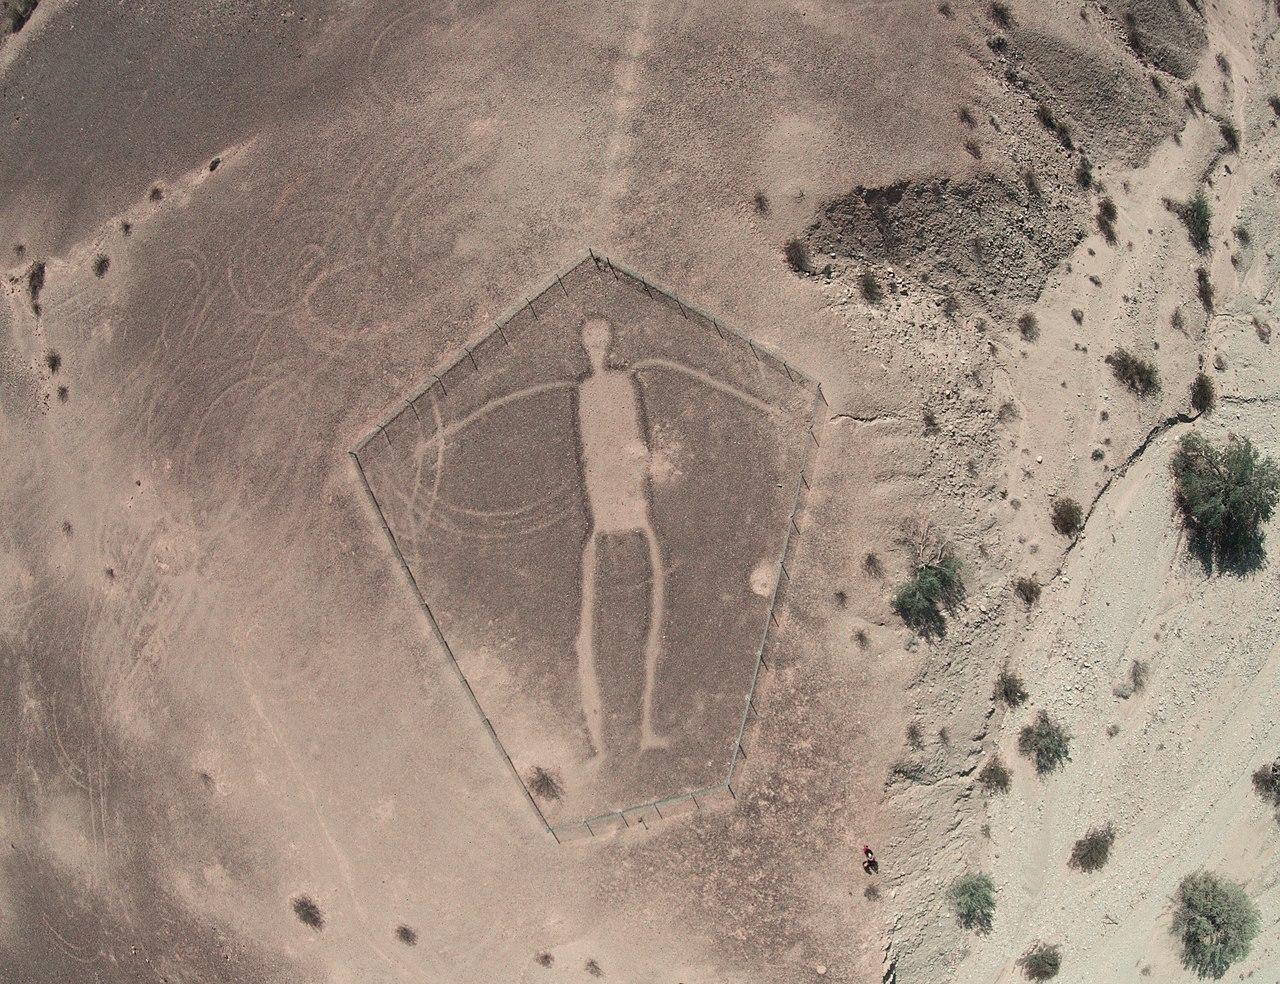 meraviglie del mondo, misteri, archeologia, storia antica, blythe intaglios